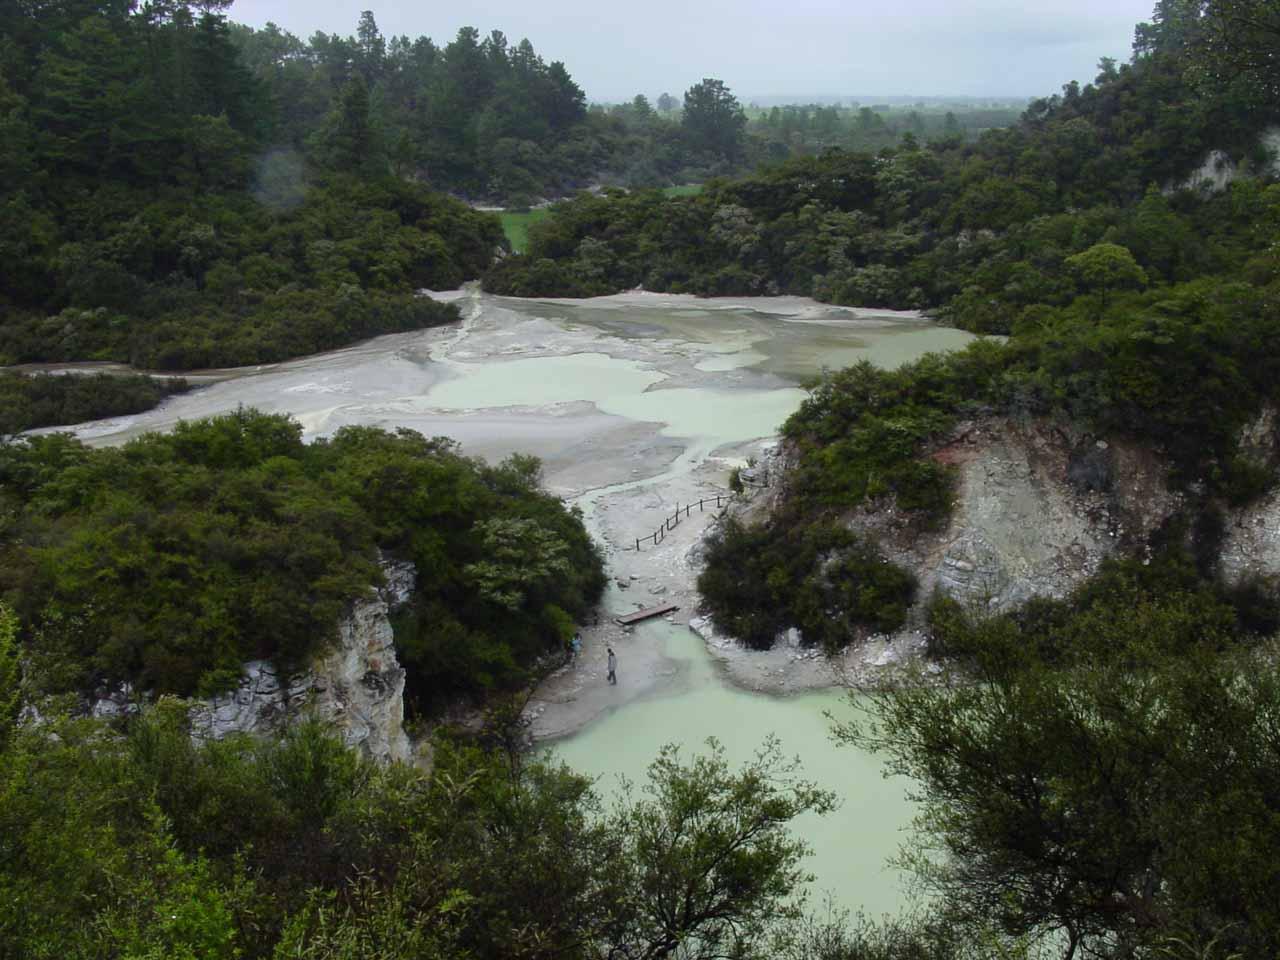 Contextual view back towards the thermal wonderland of Wai-o-tapu despite the rain